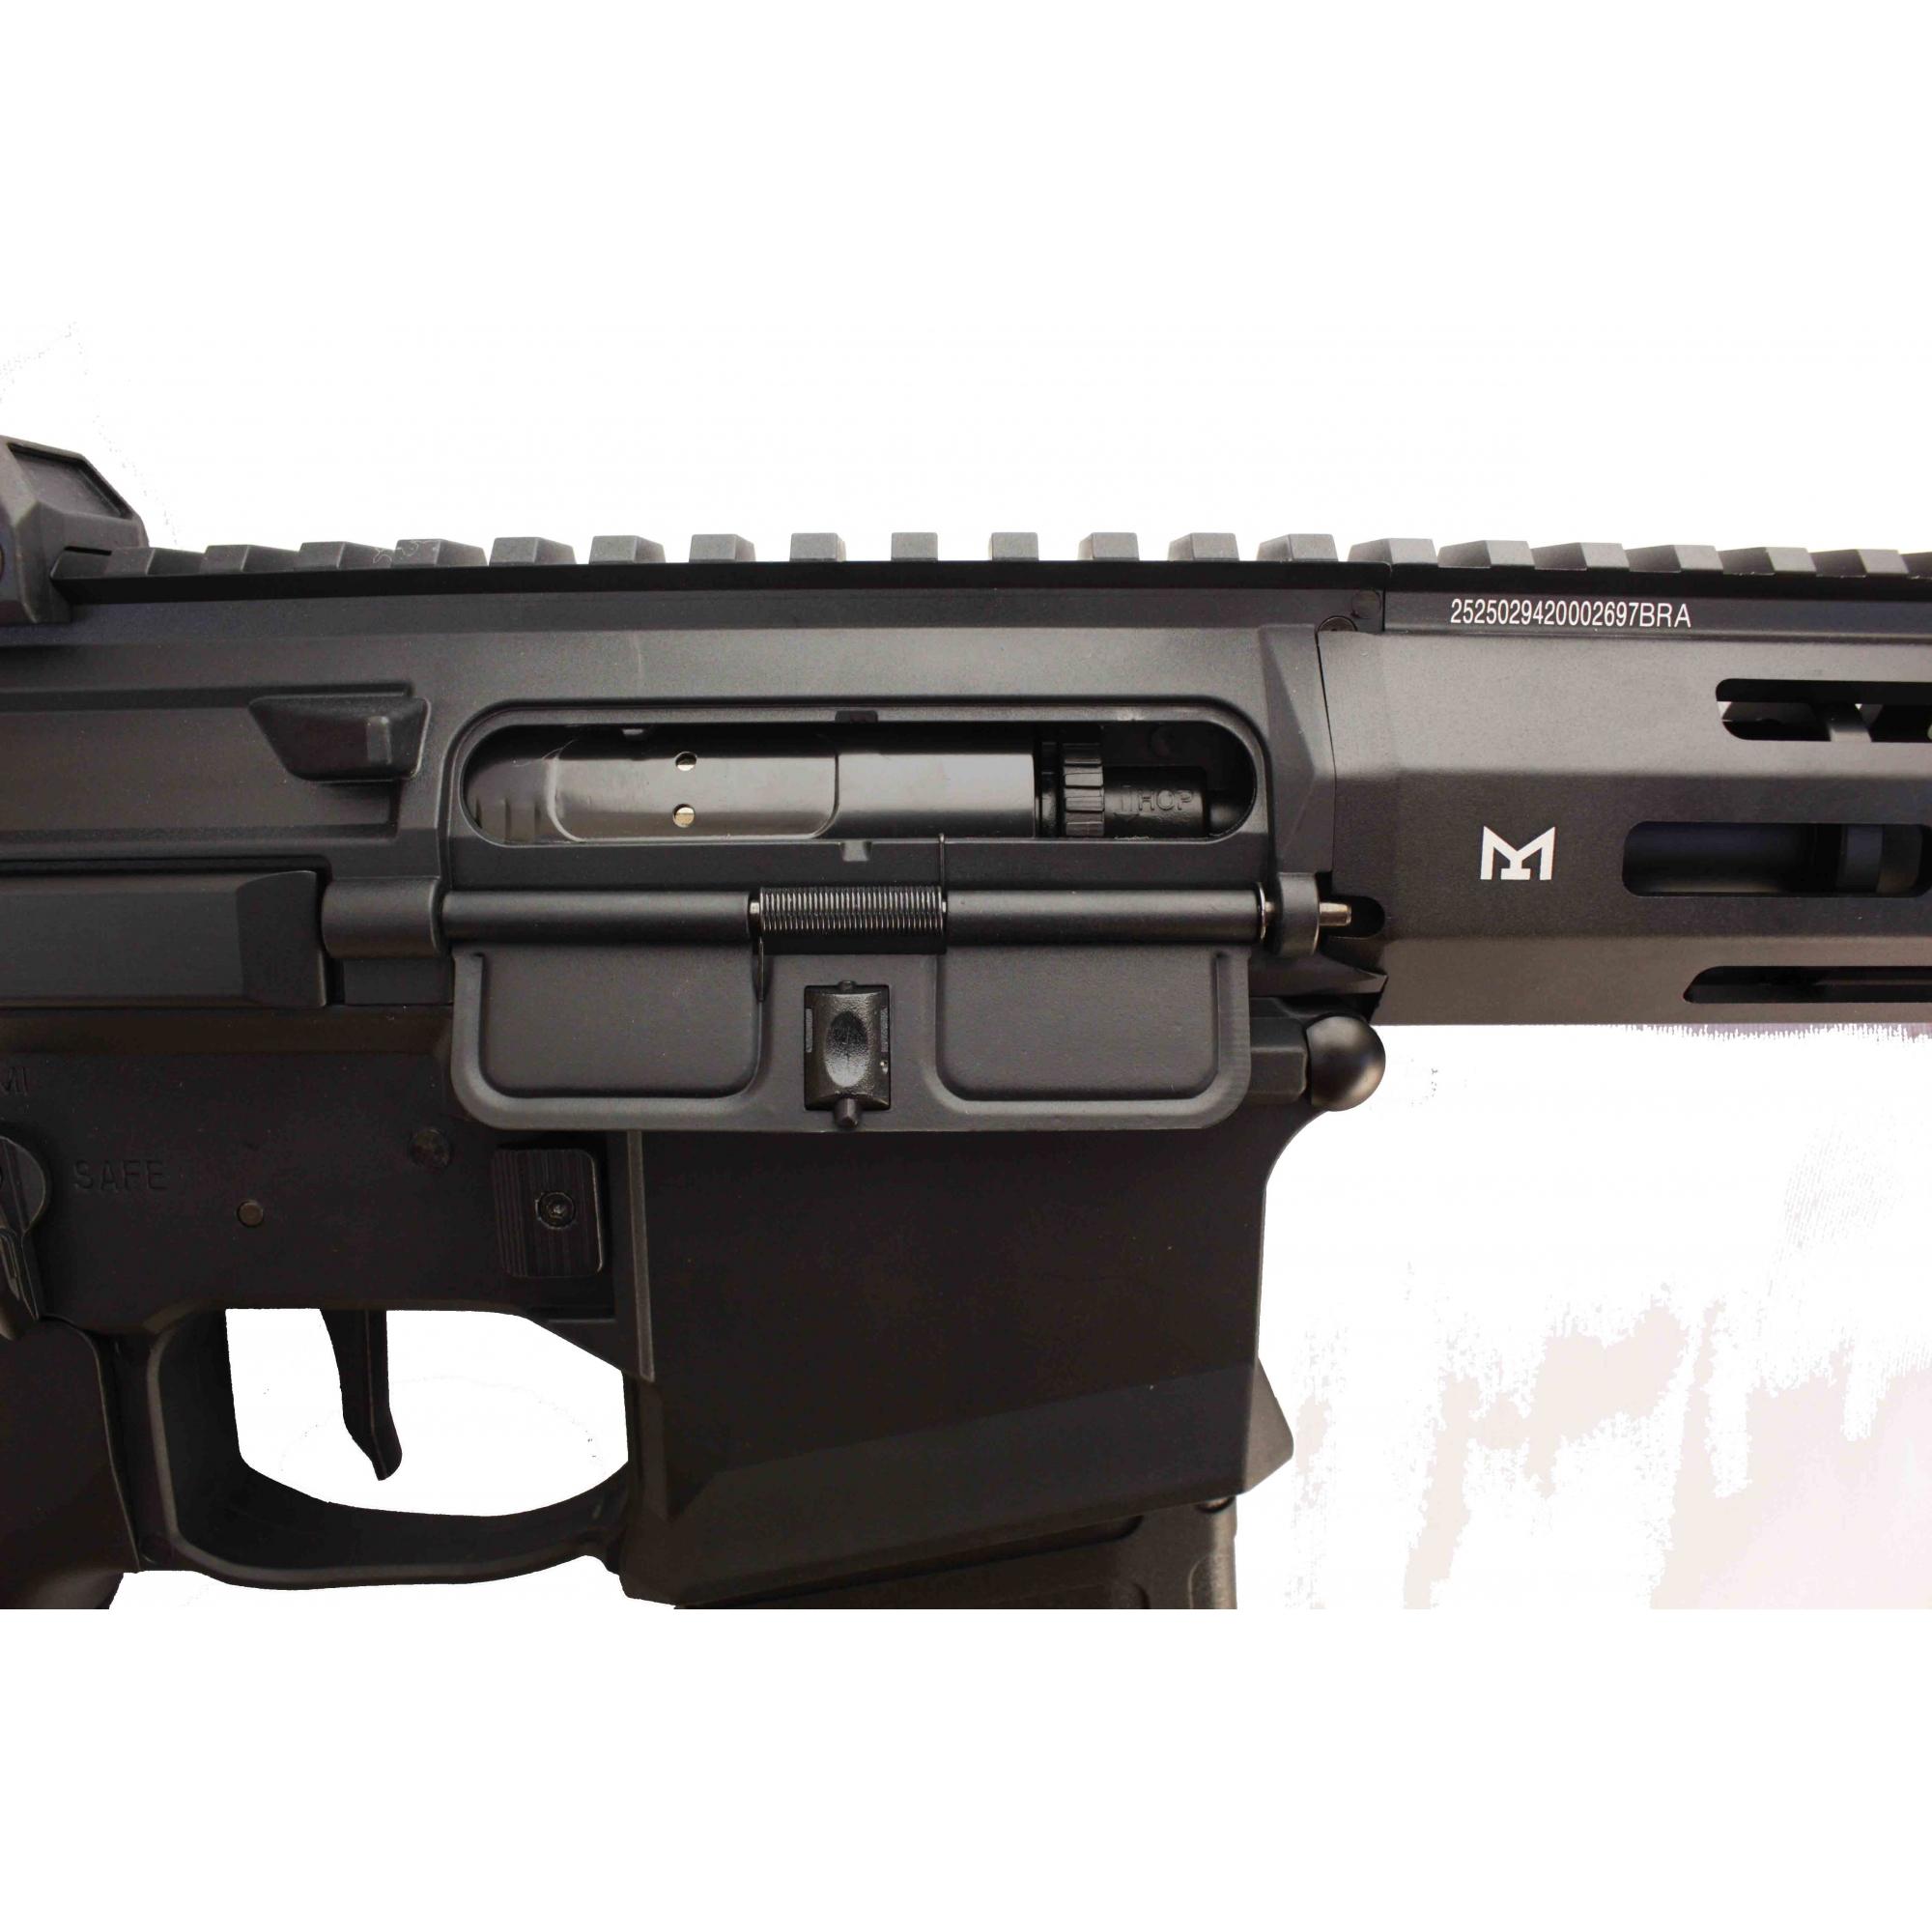 Rifle Airsoft M4 D.E. Armory Bronco  M904D